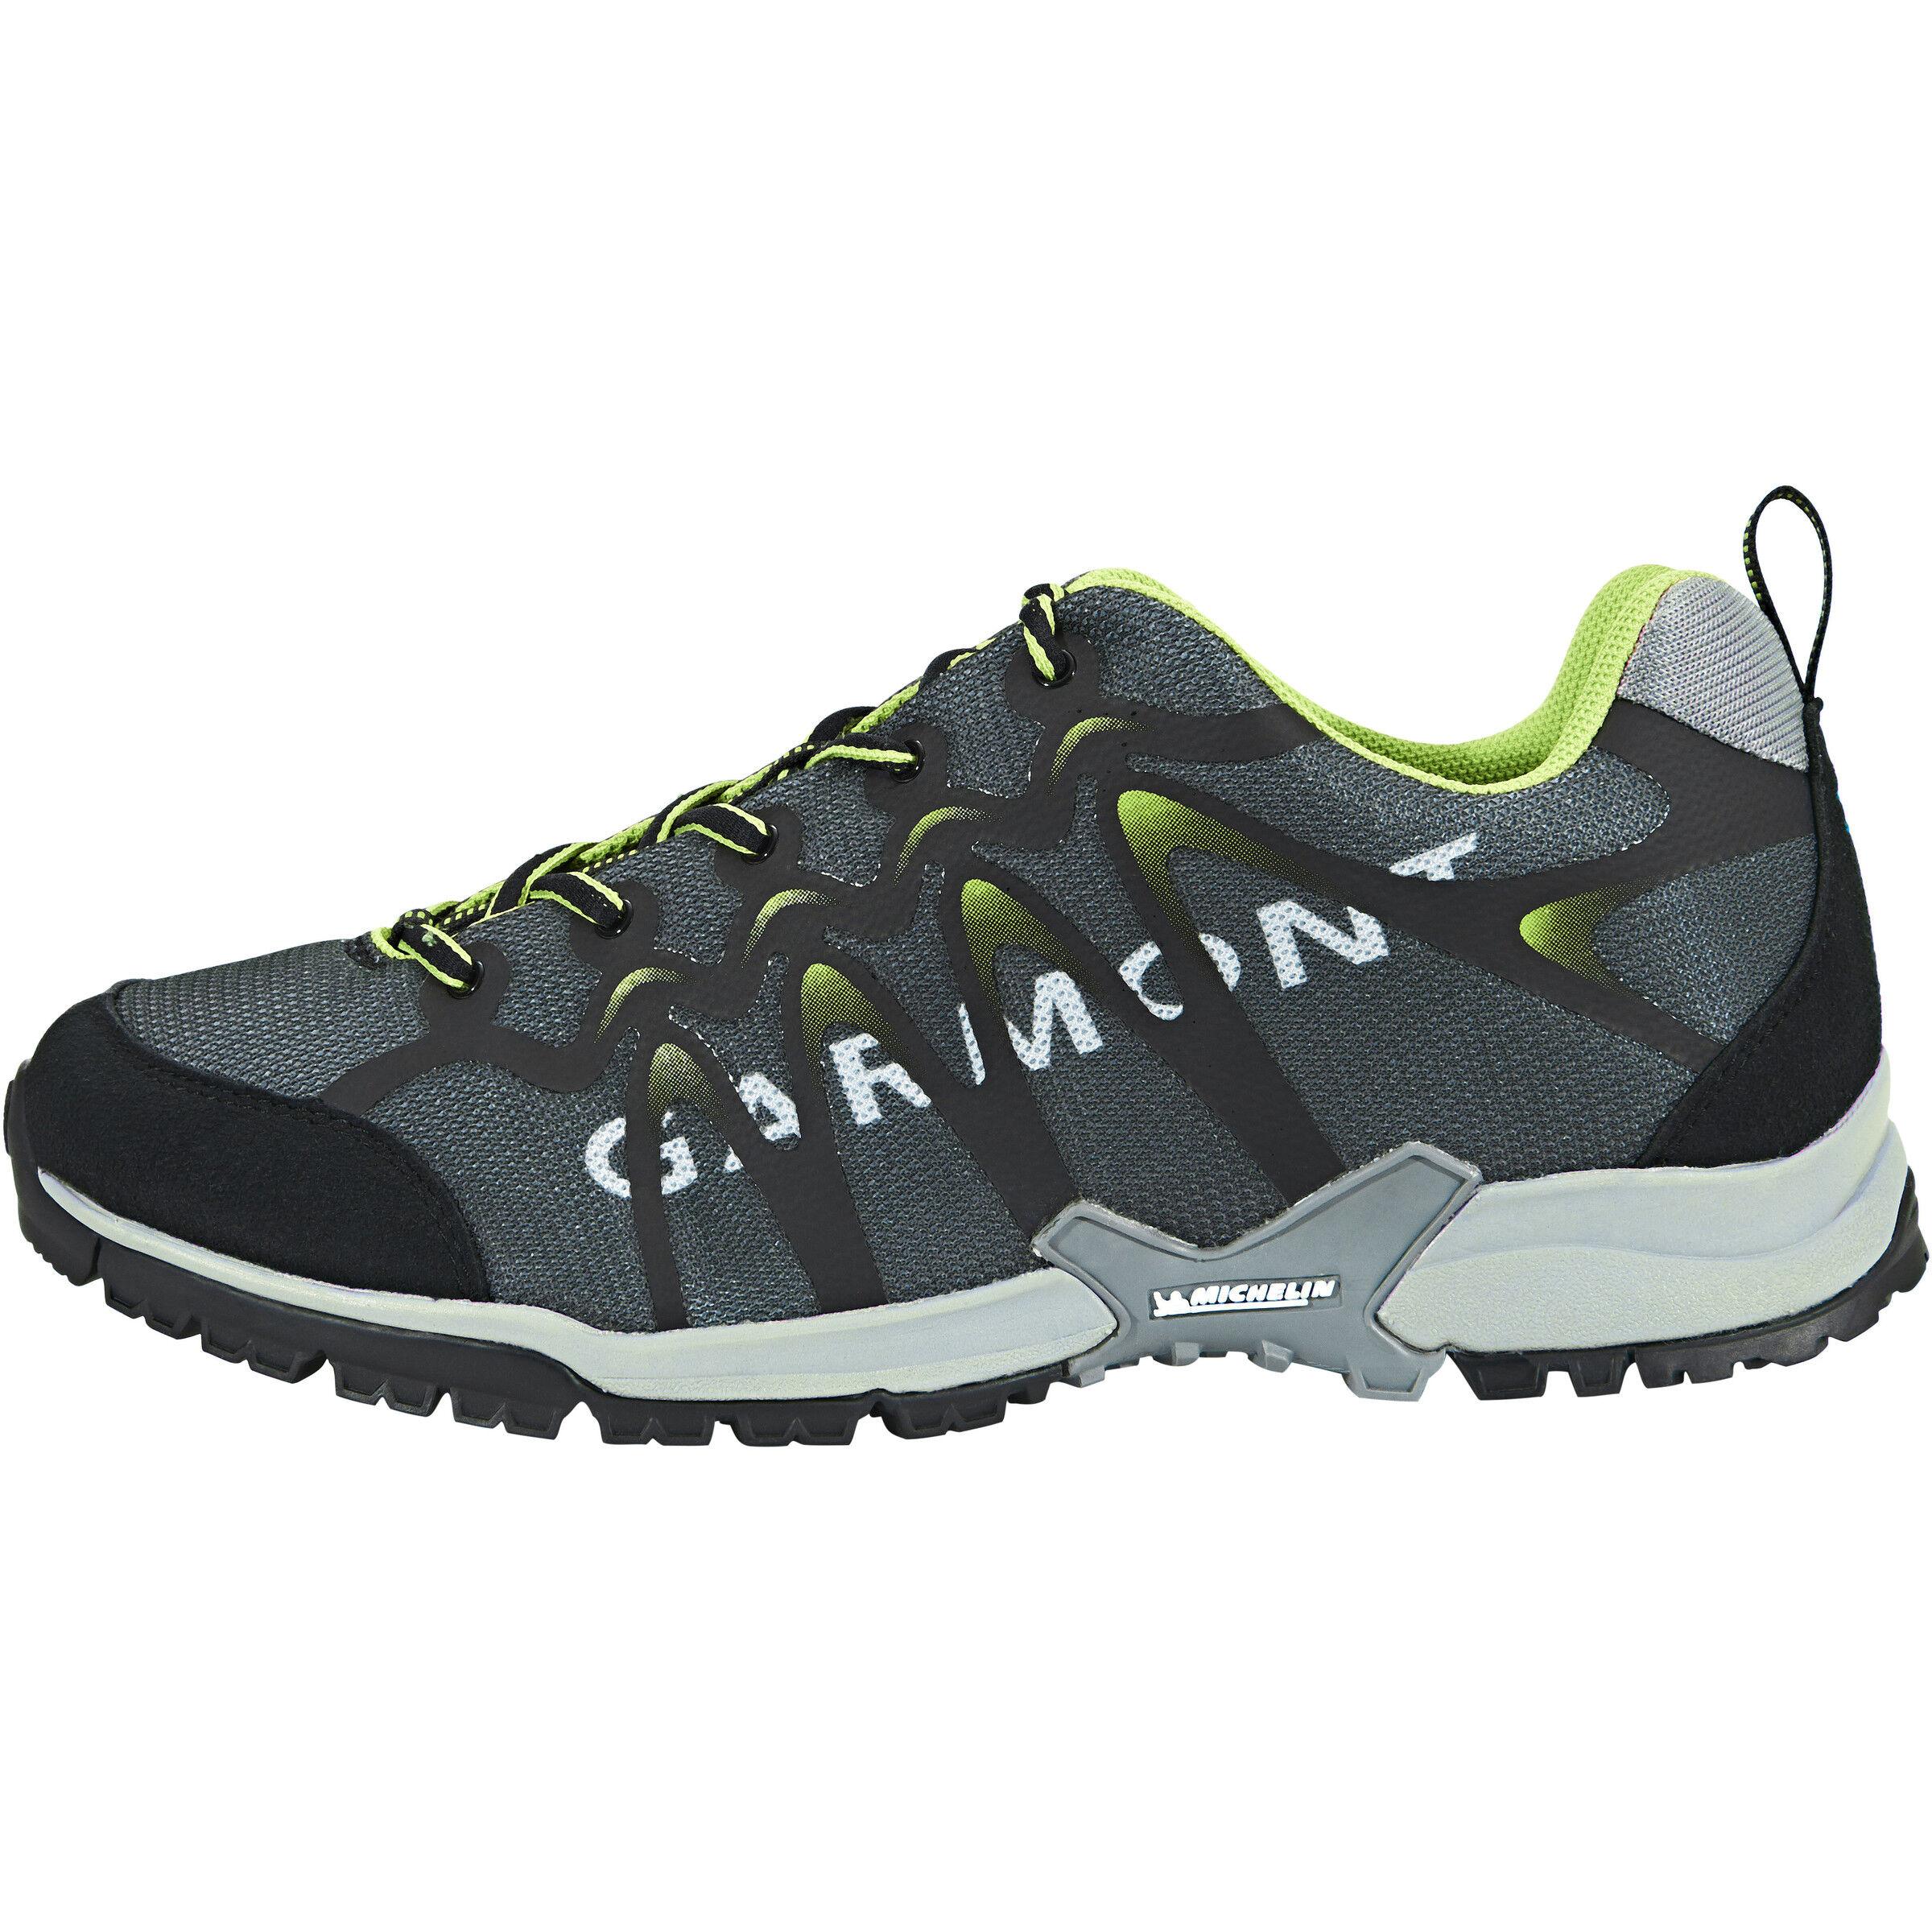 Garmont Hurricane Shoes Herren anthracitegreen